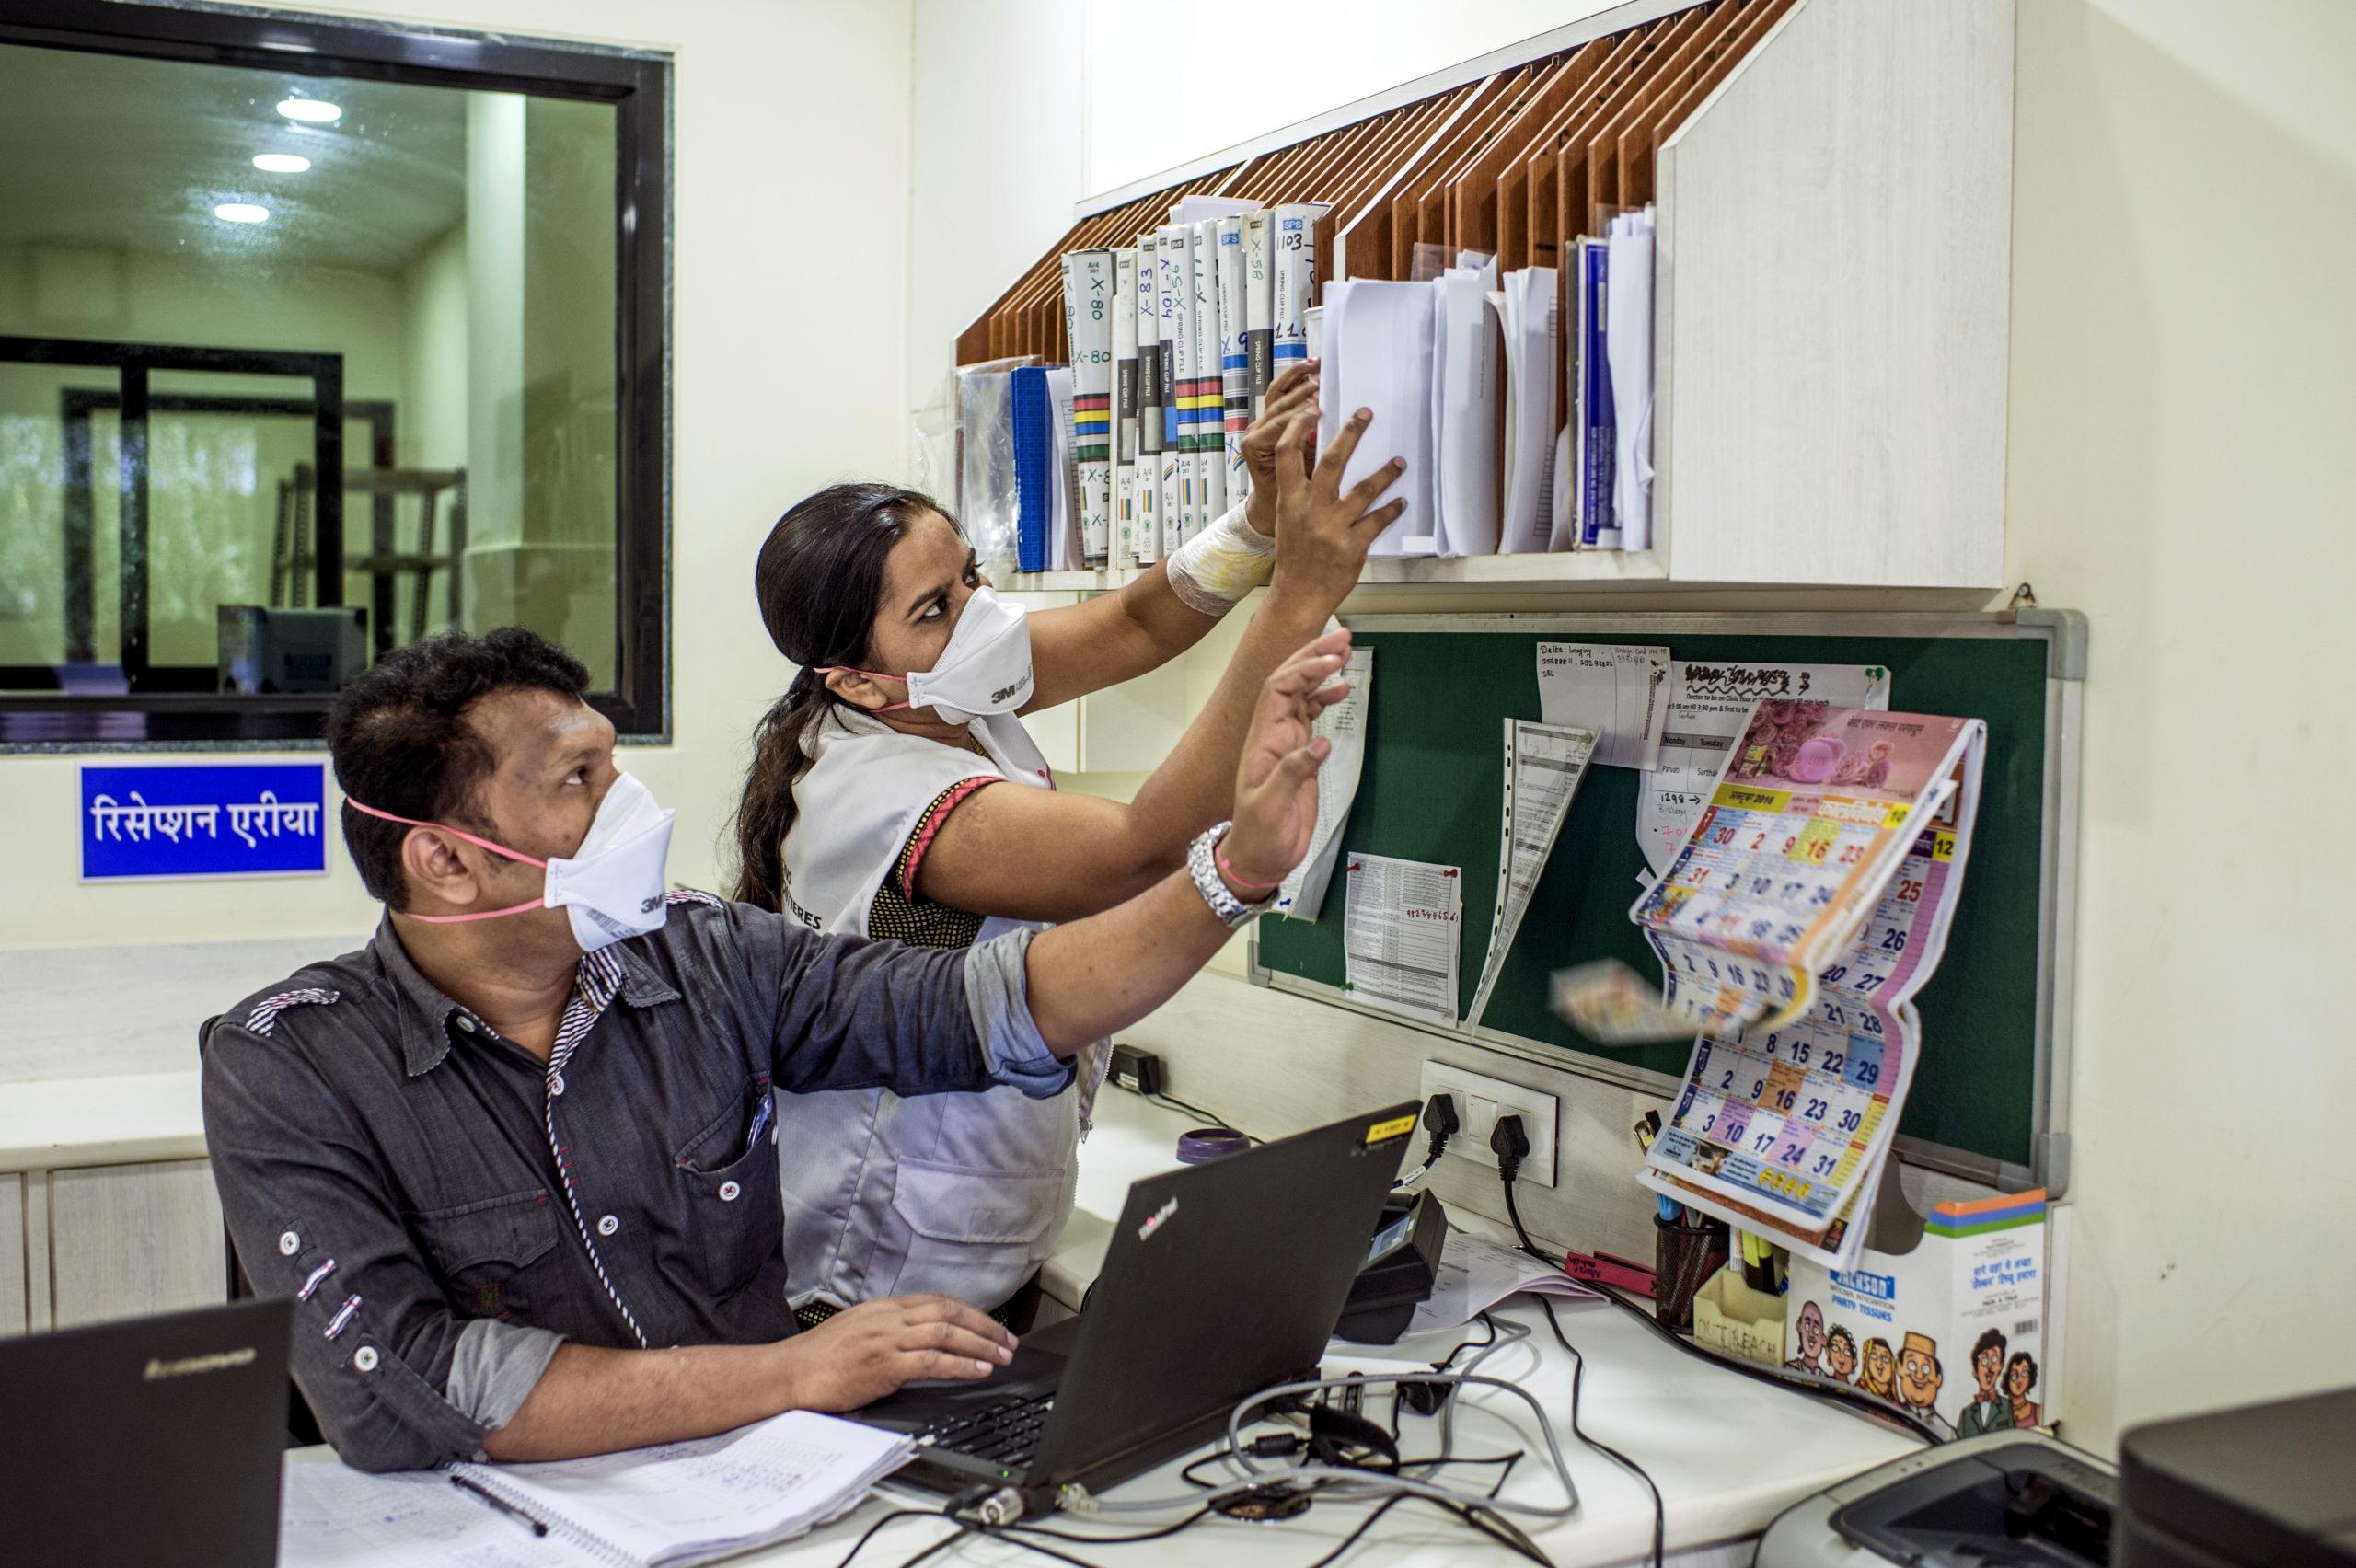 Put science on the frontline in emergencies